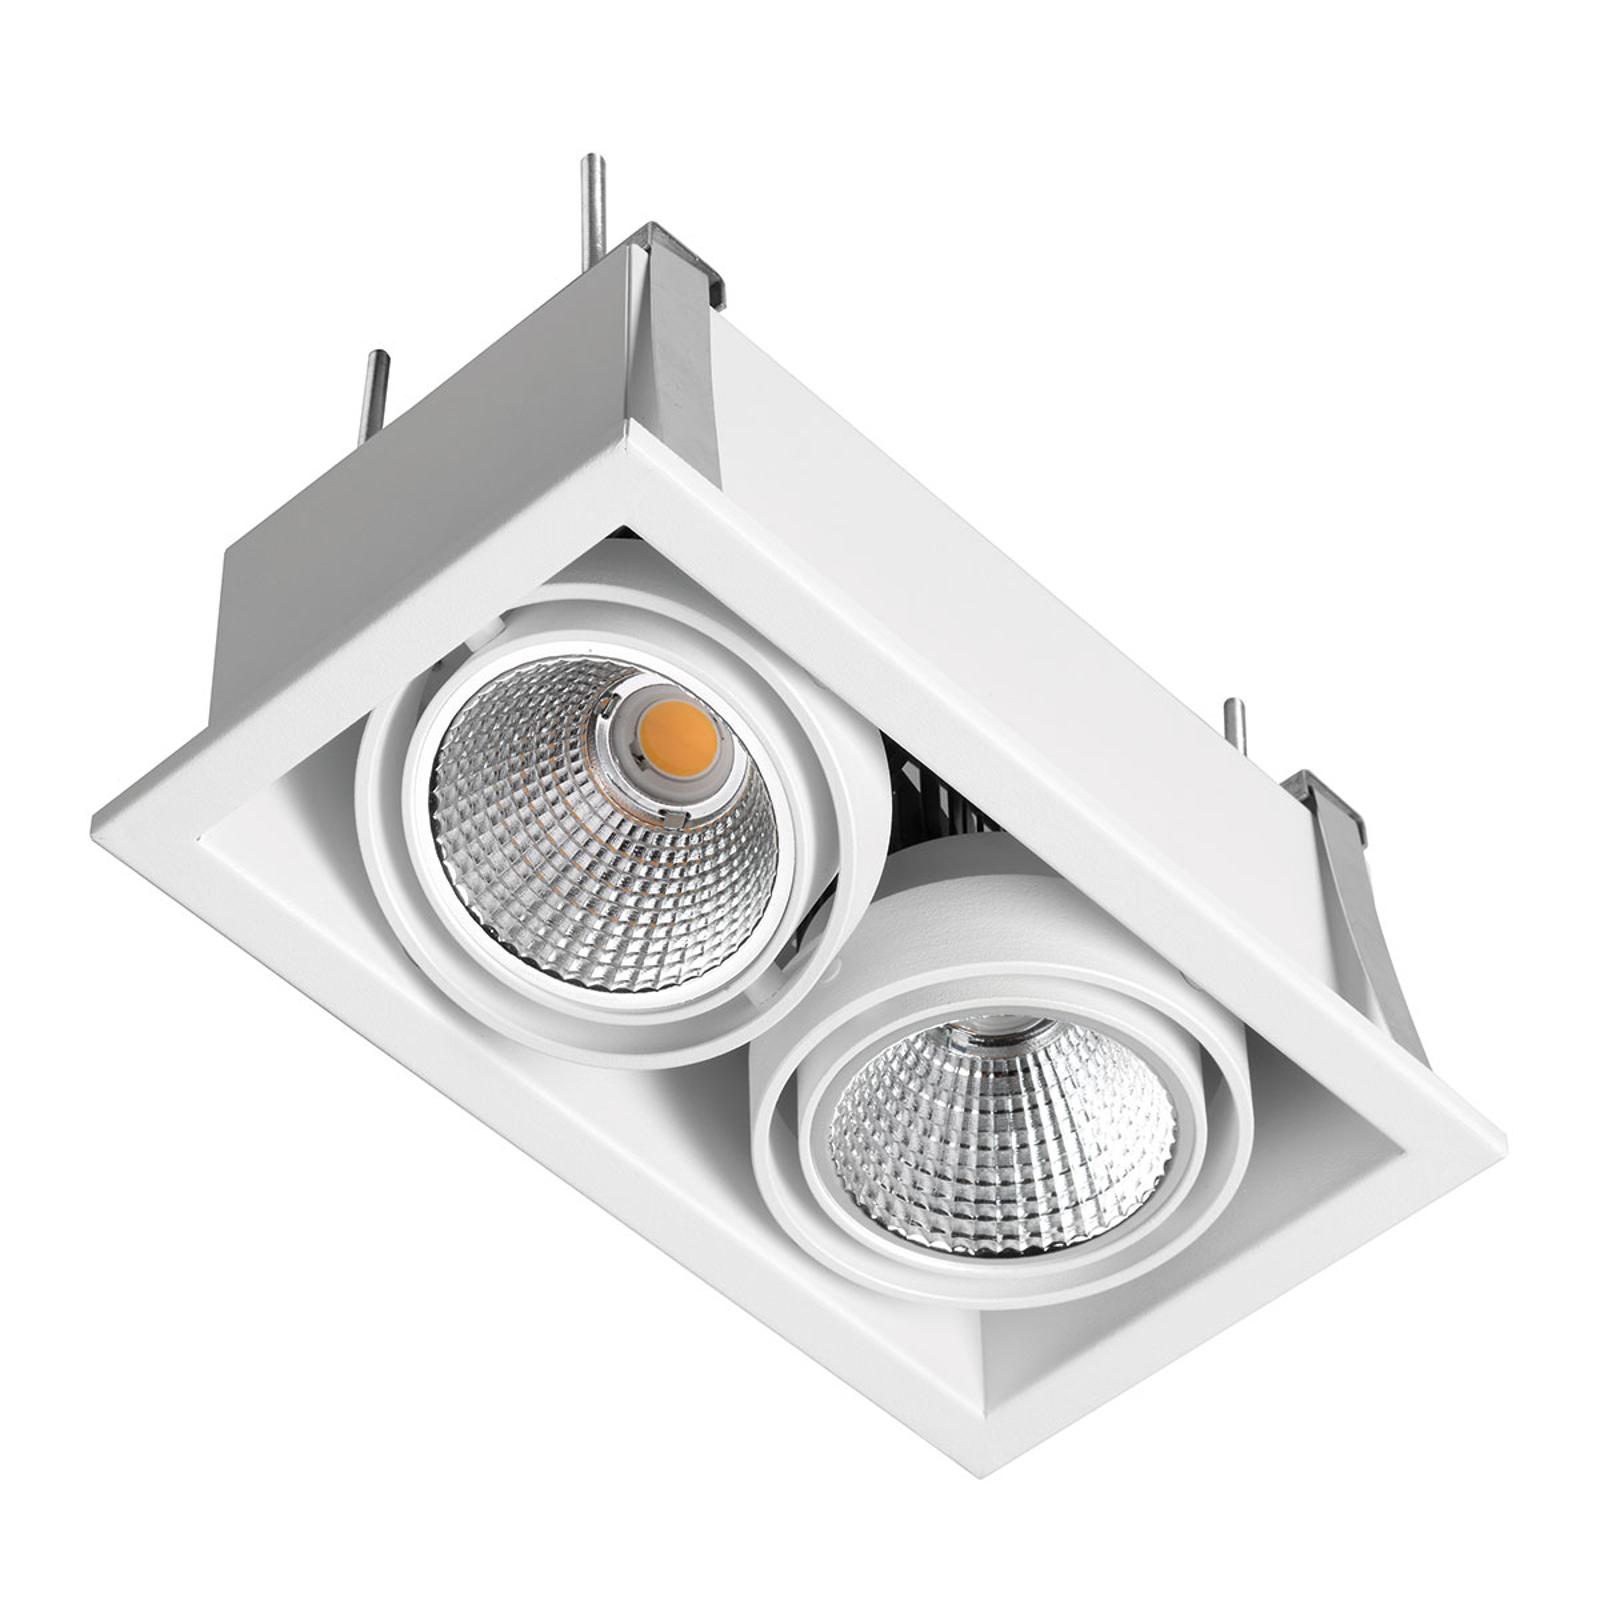 LED-Einbaustrahler Zipar Duo Recessed 39W, 4.000K